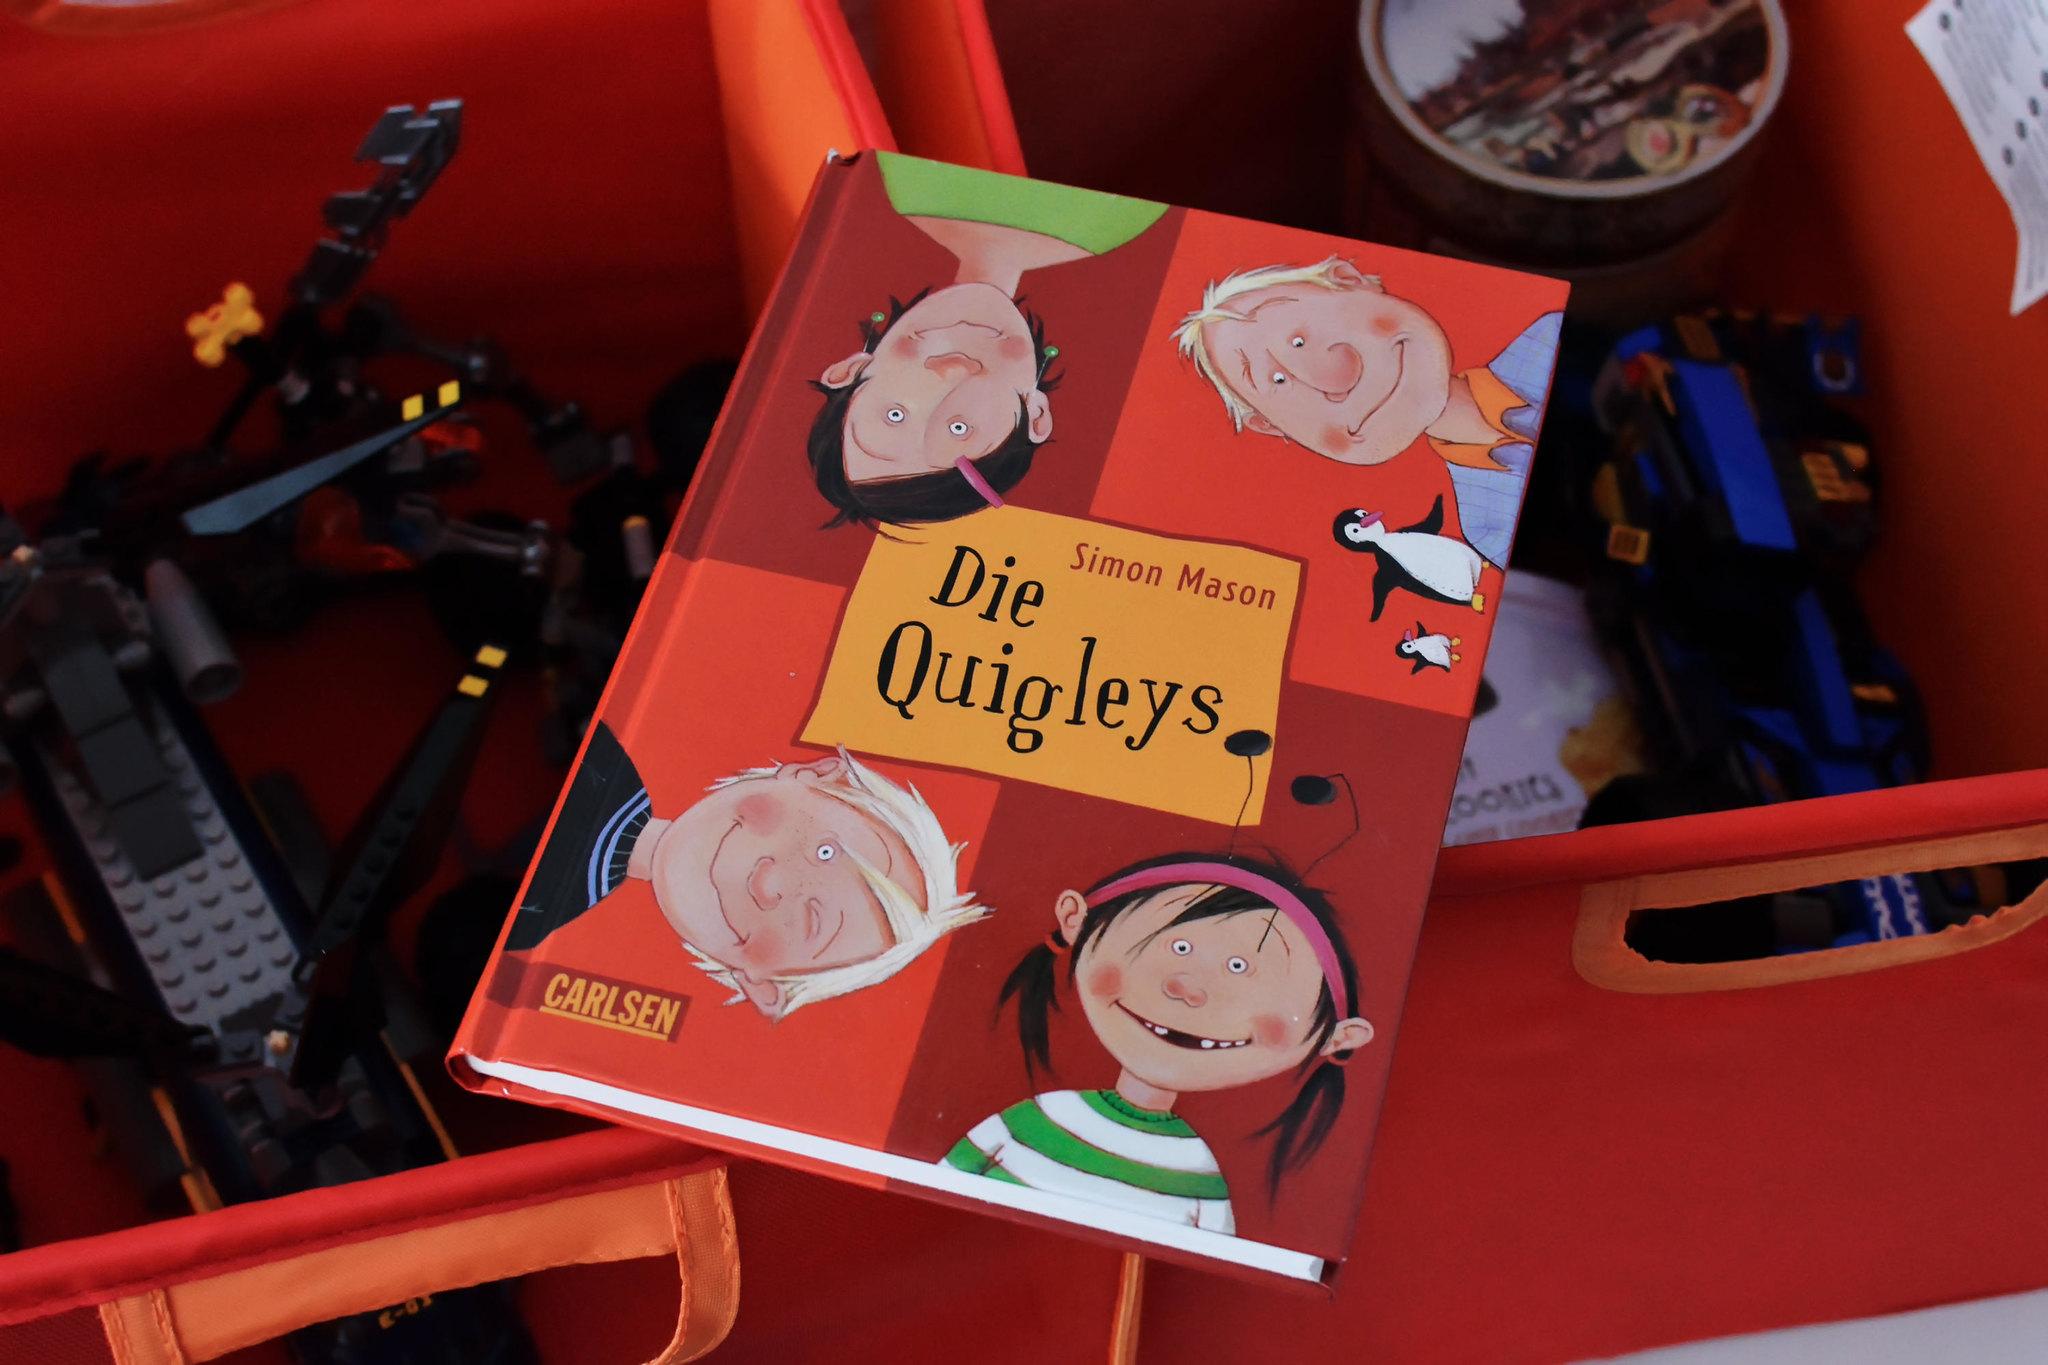 Die Quigleys